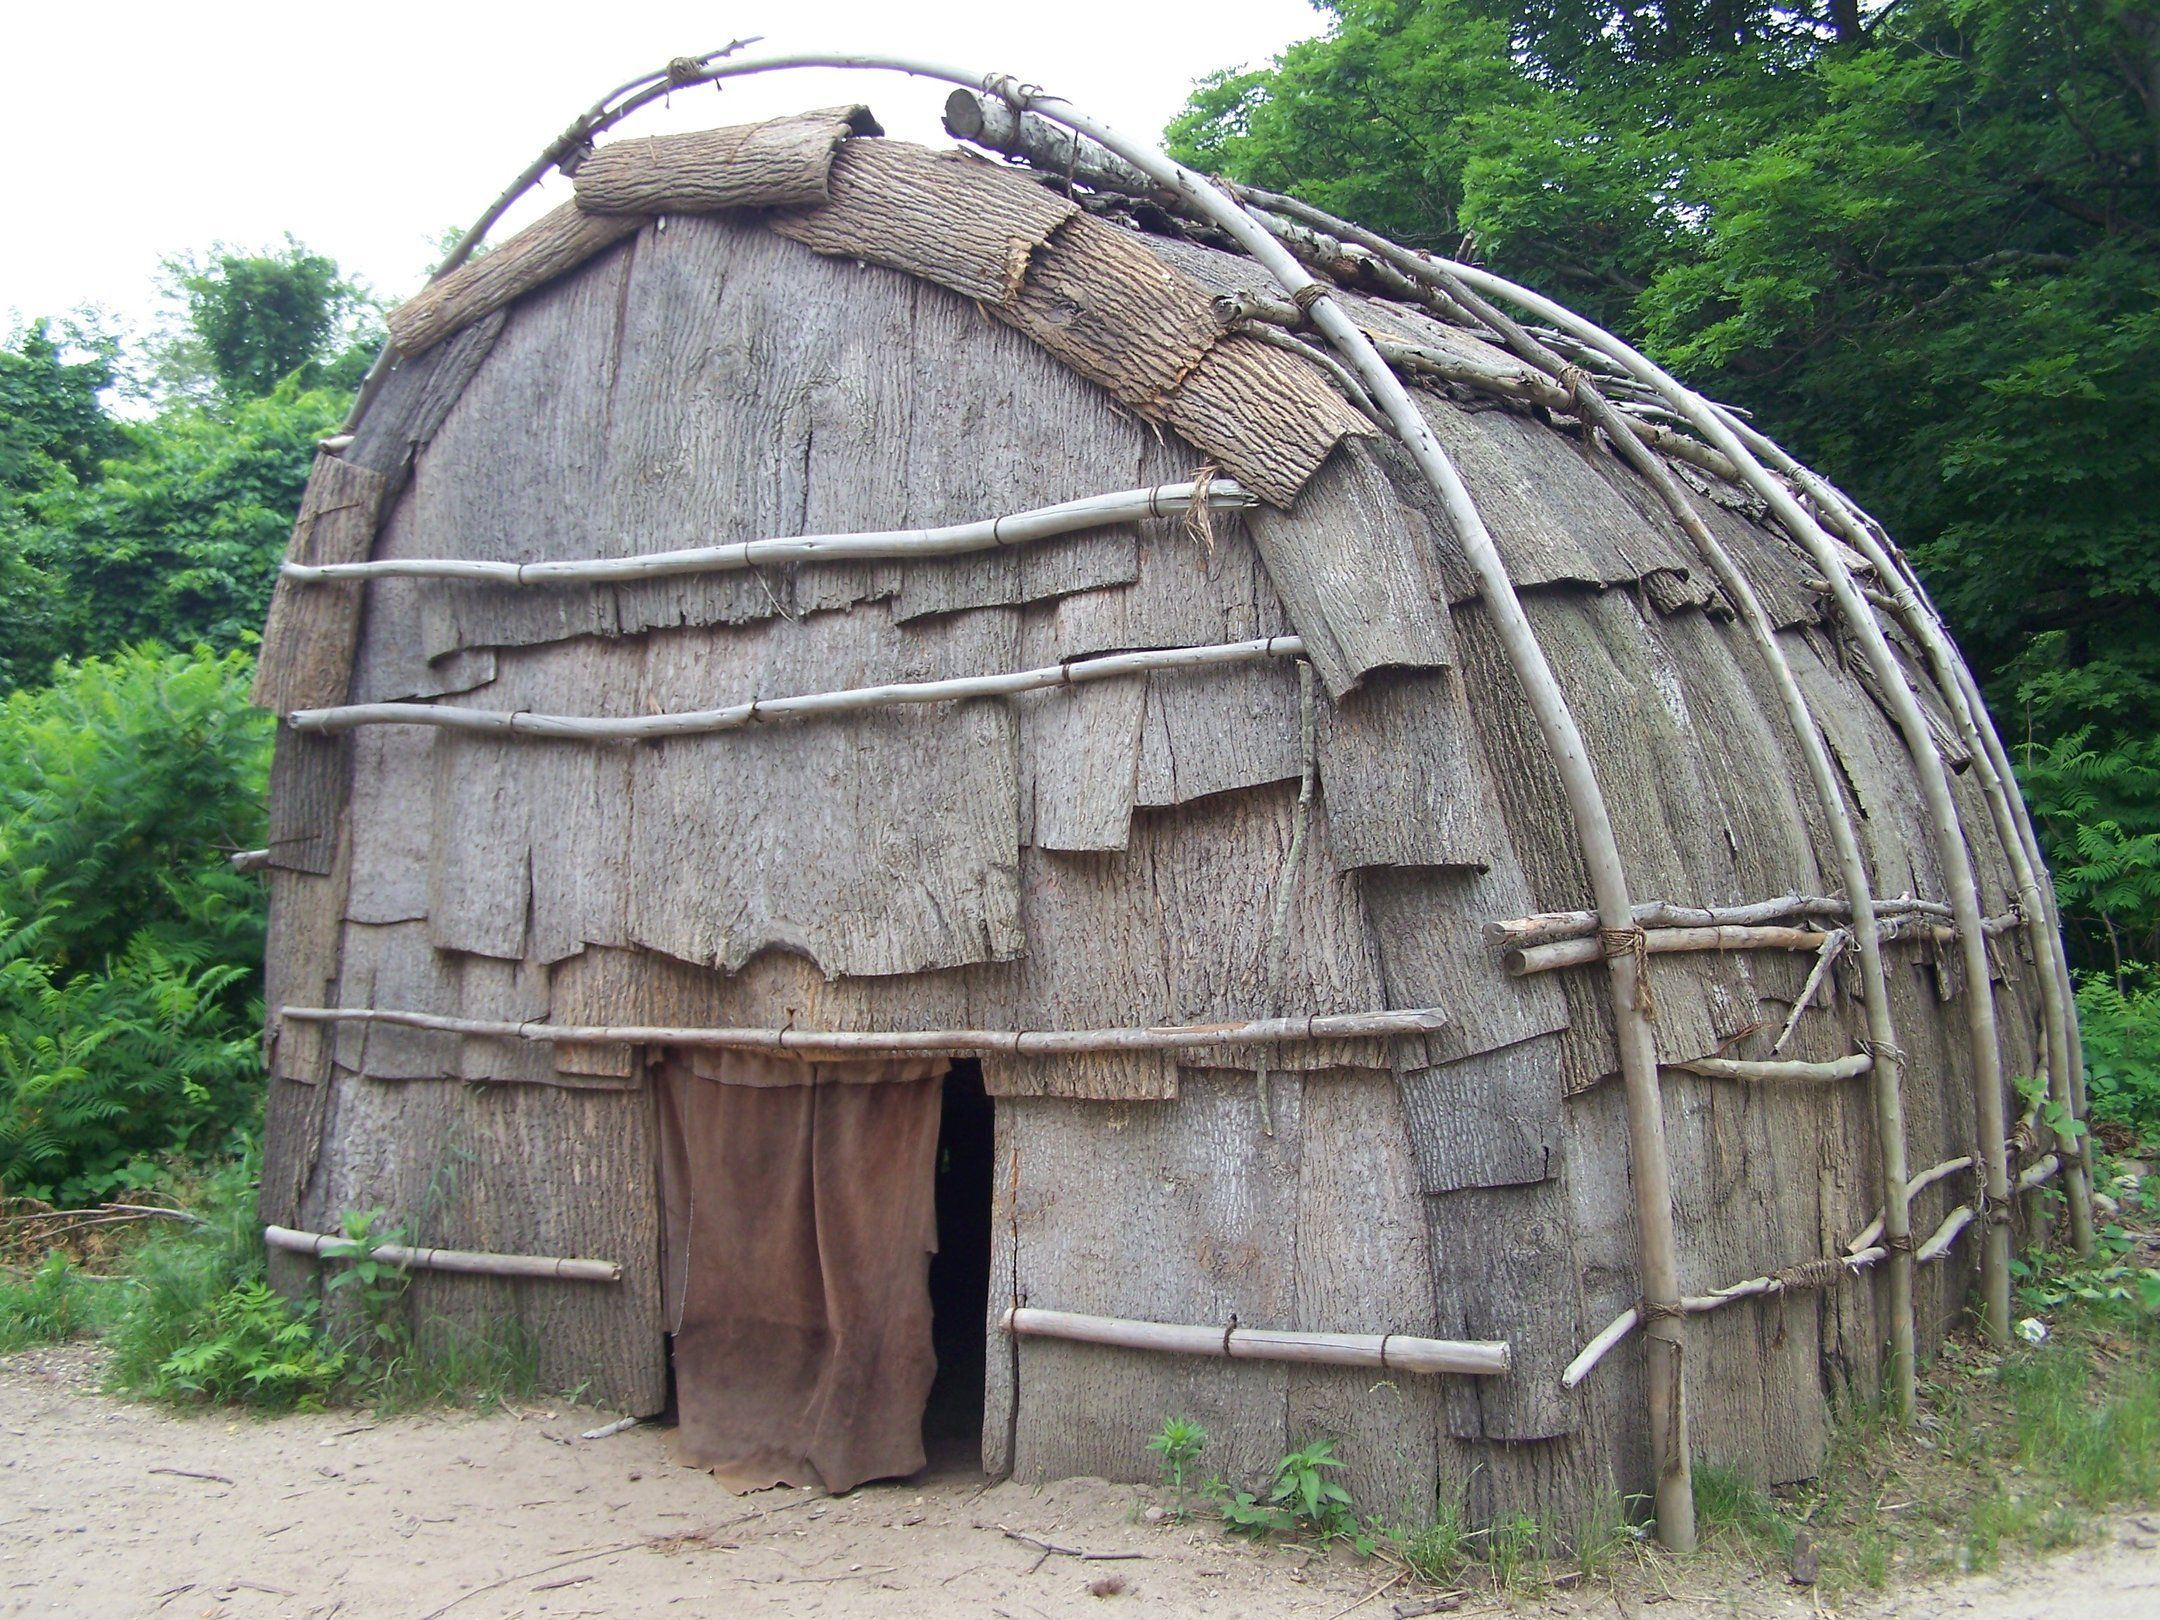 Wampanoag wetu house (With images) Native american